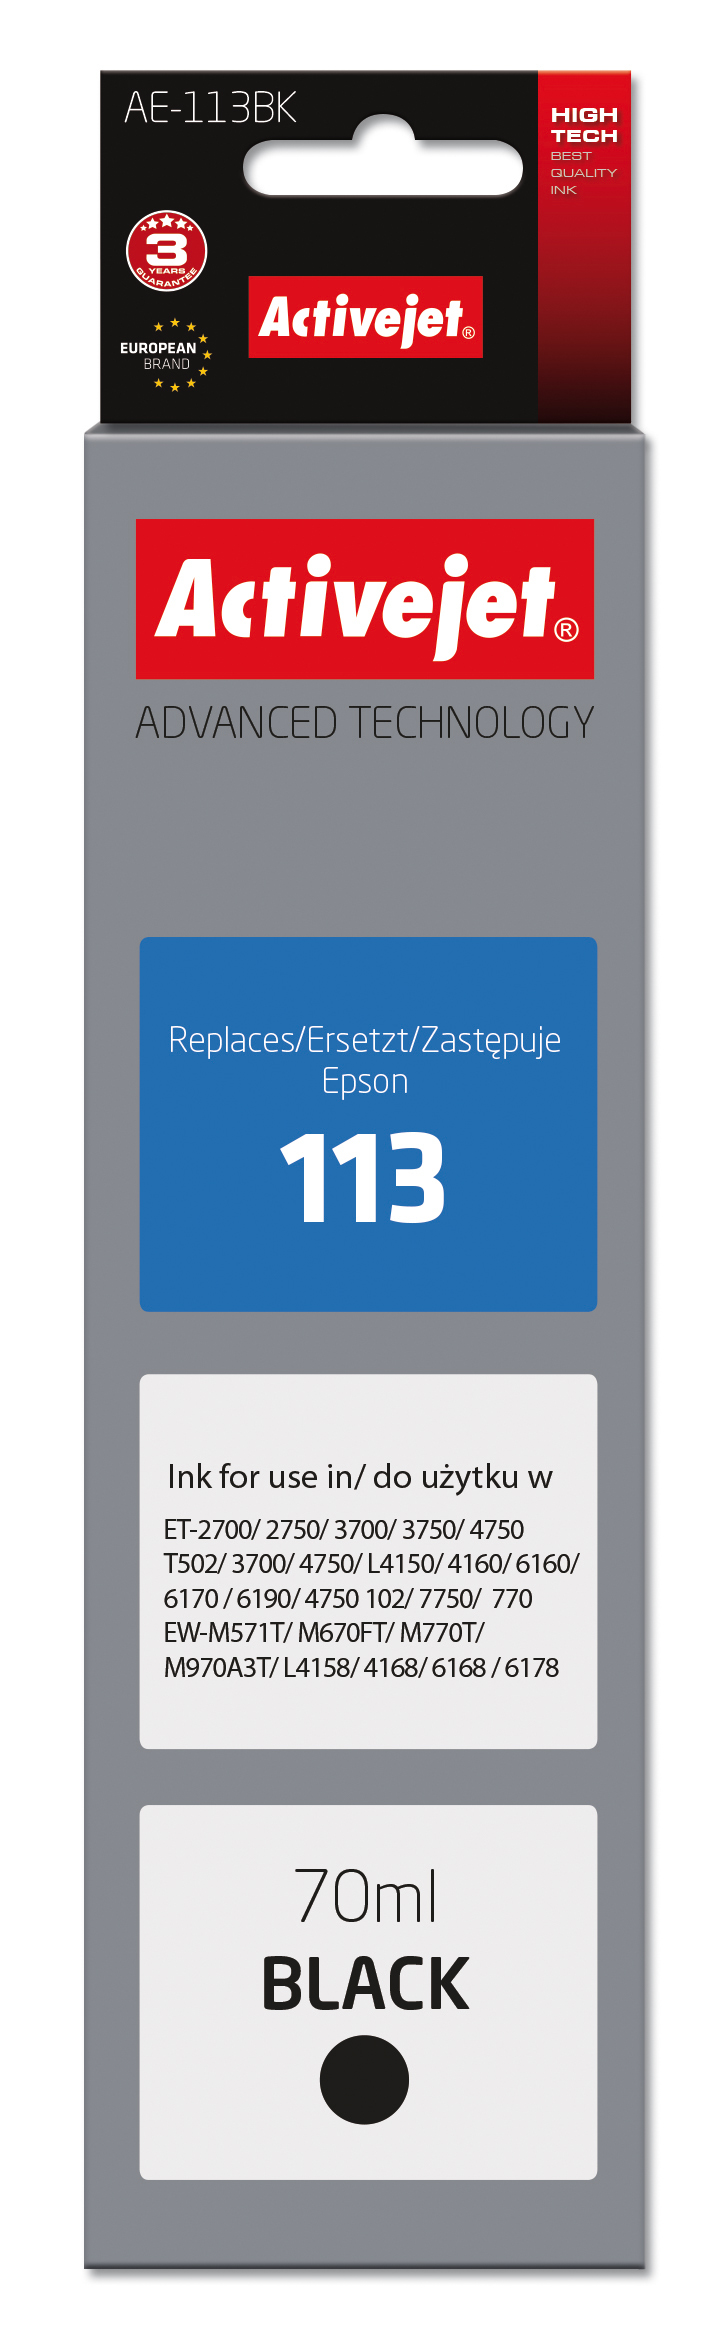 Tusz Activejet AE-113Bk do drukarki Epson, Zamiennik Epson 113 C13T06B140;  Supreme; 70 ml; czarny.